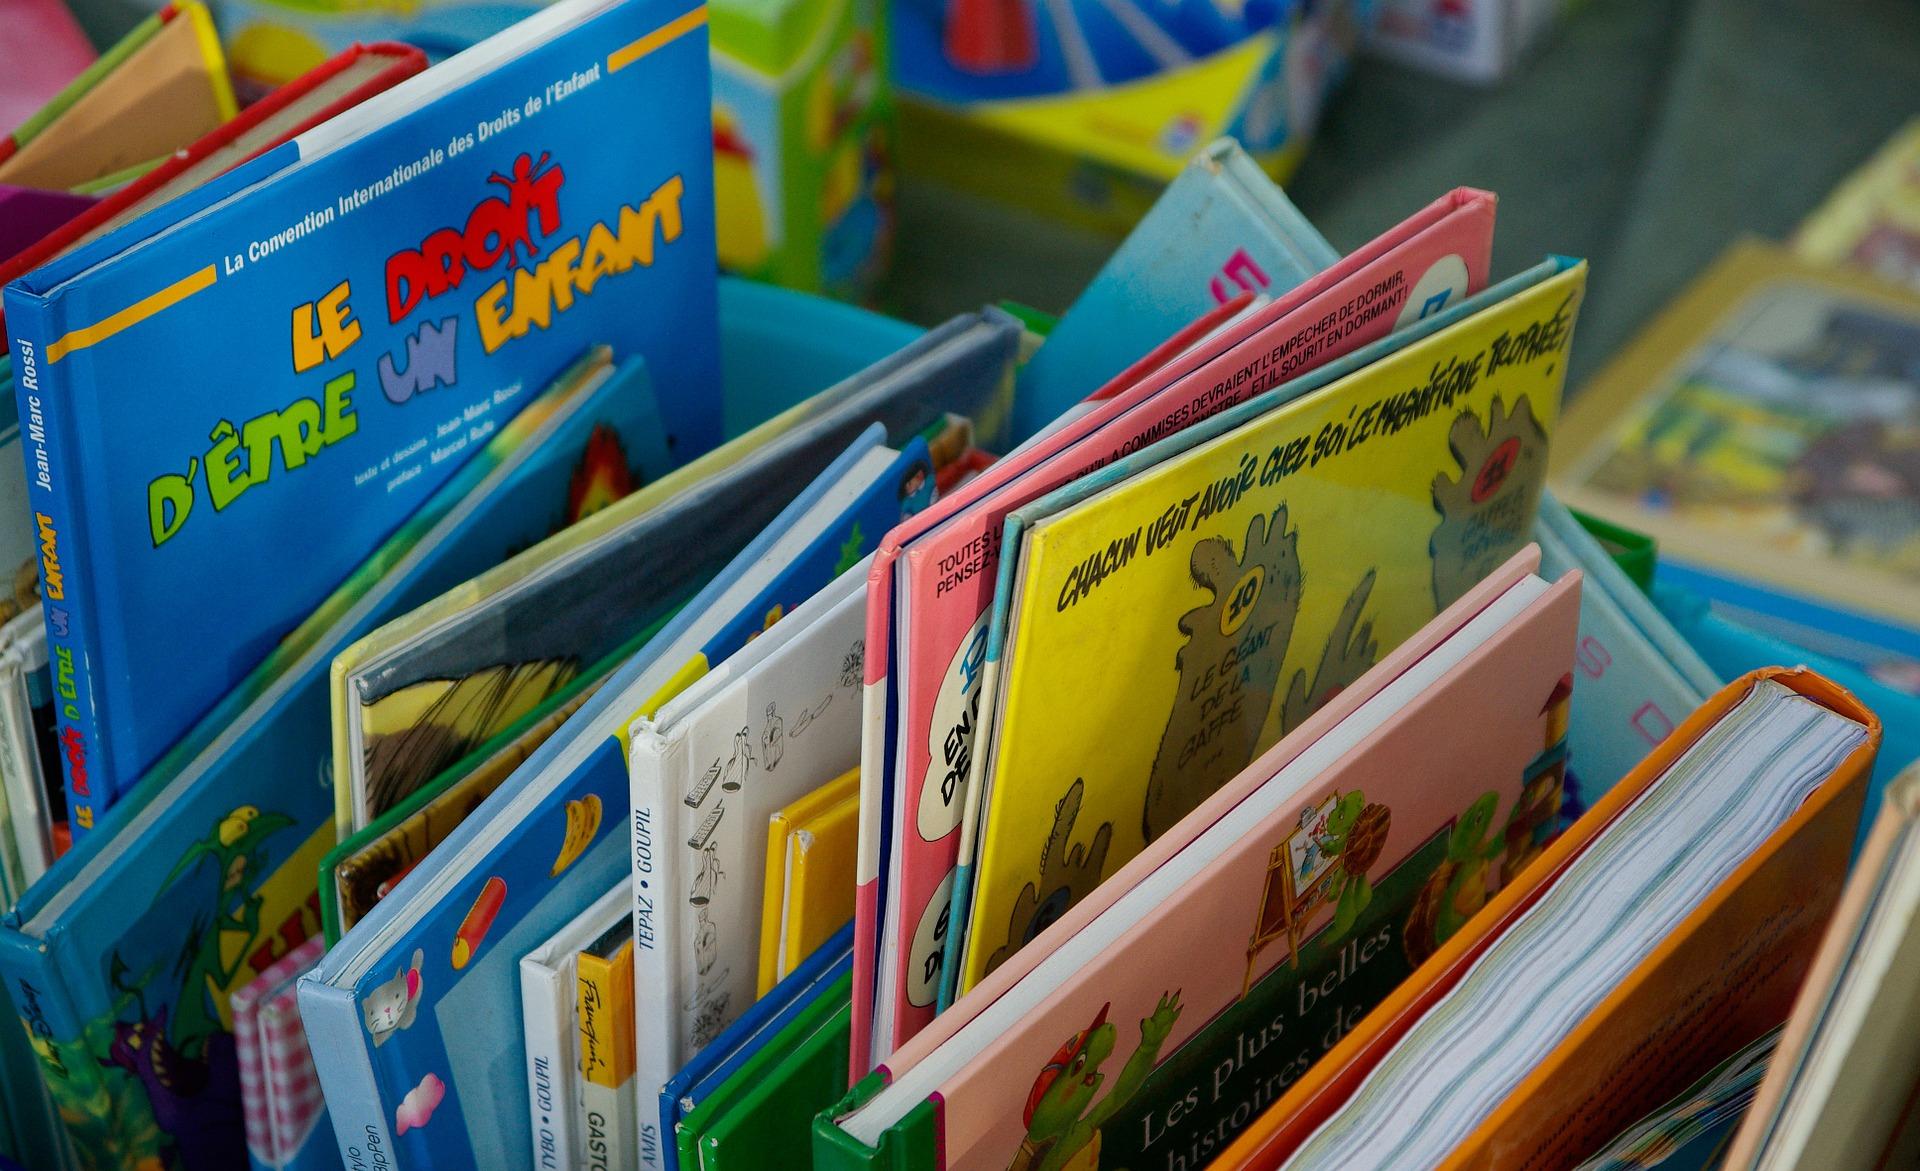 French children books - let's speak french brisbane